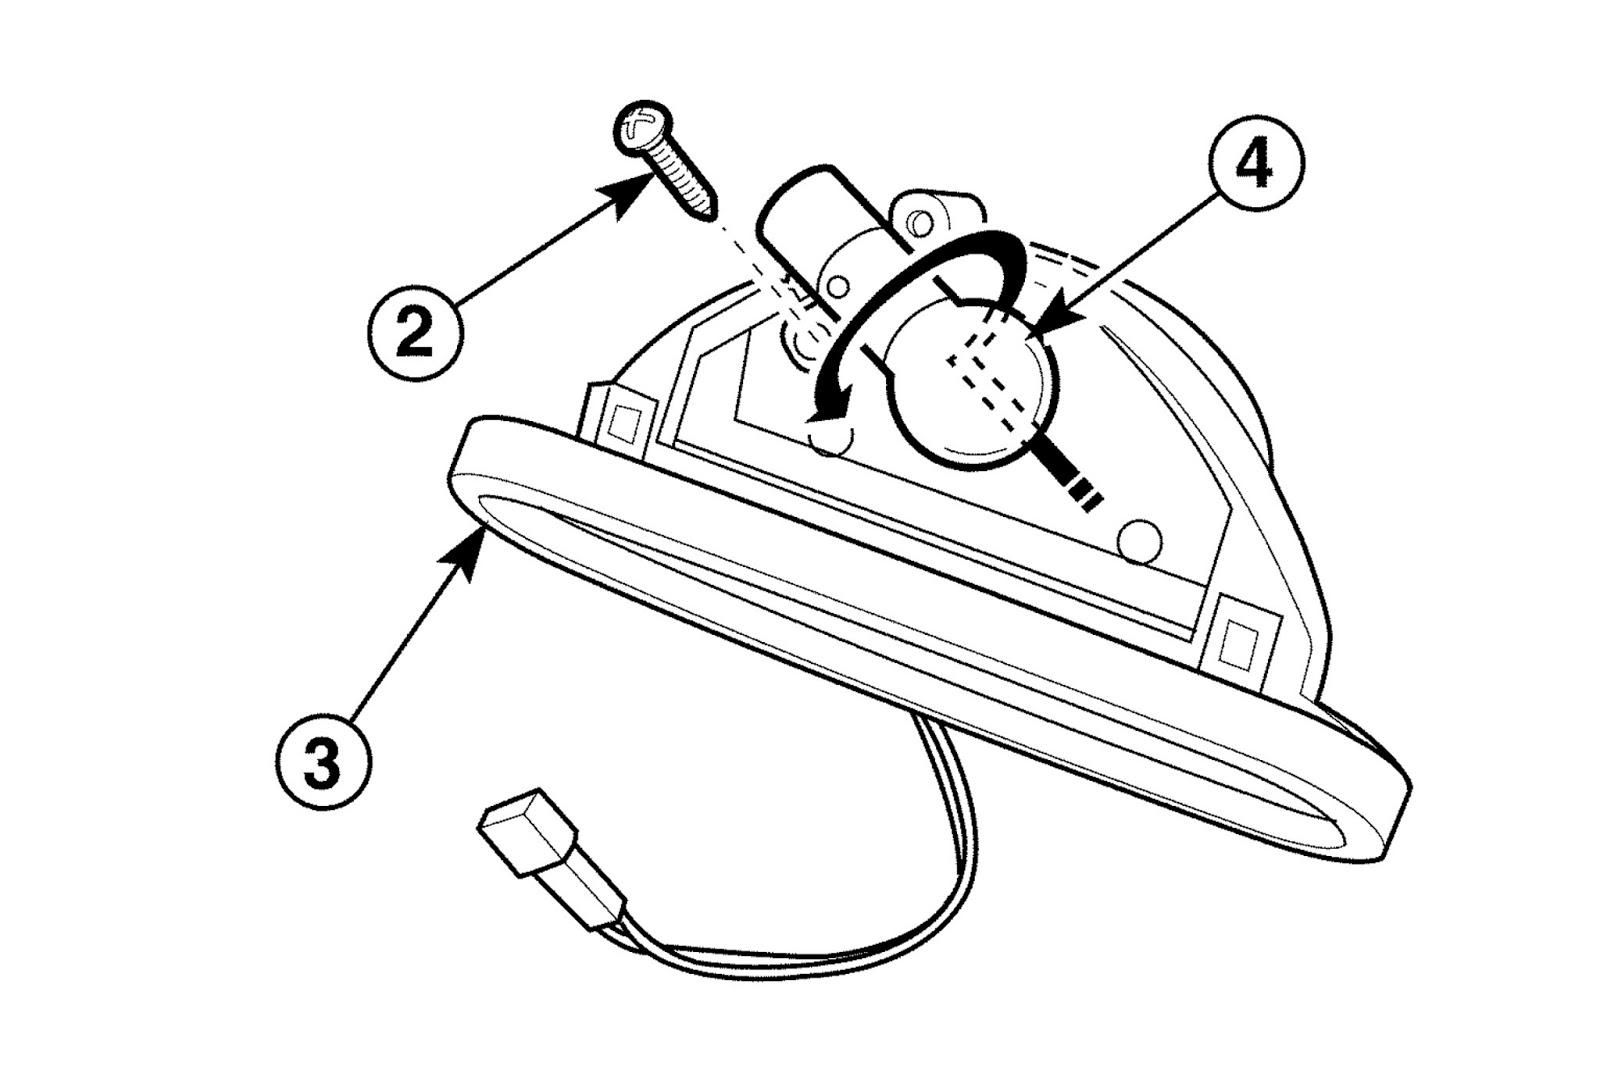 Chmsl mounting bracket